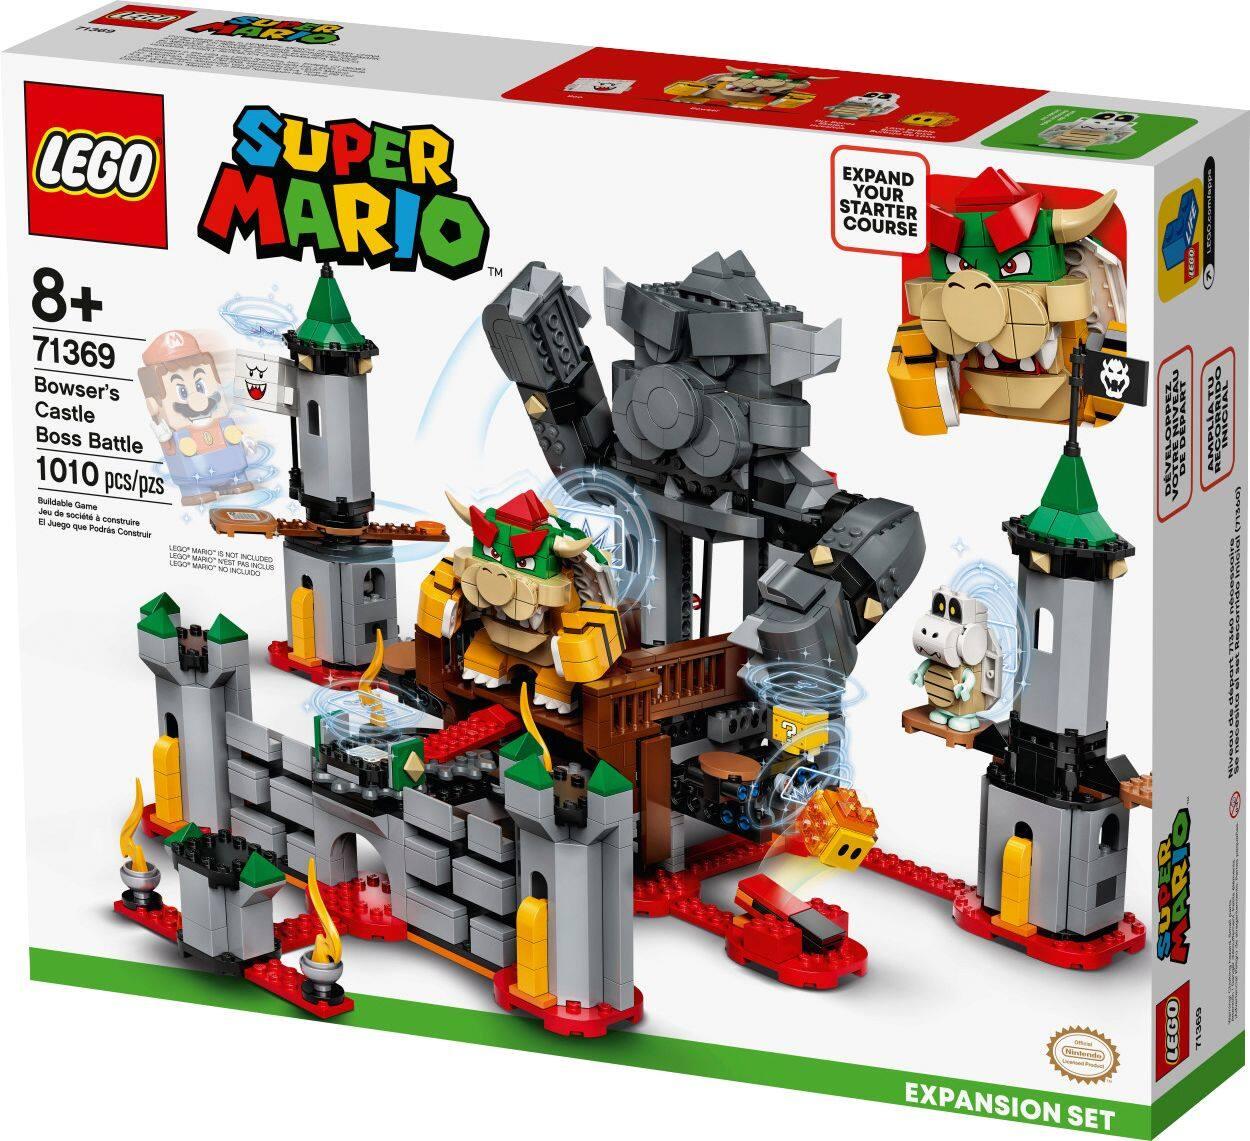 LEGO Super Mario Bowser's Castle $79.99, Toads Treasure Hunt $48.99 and more